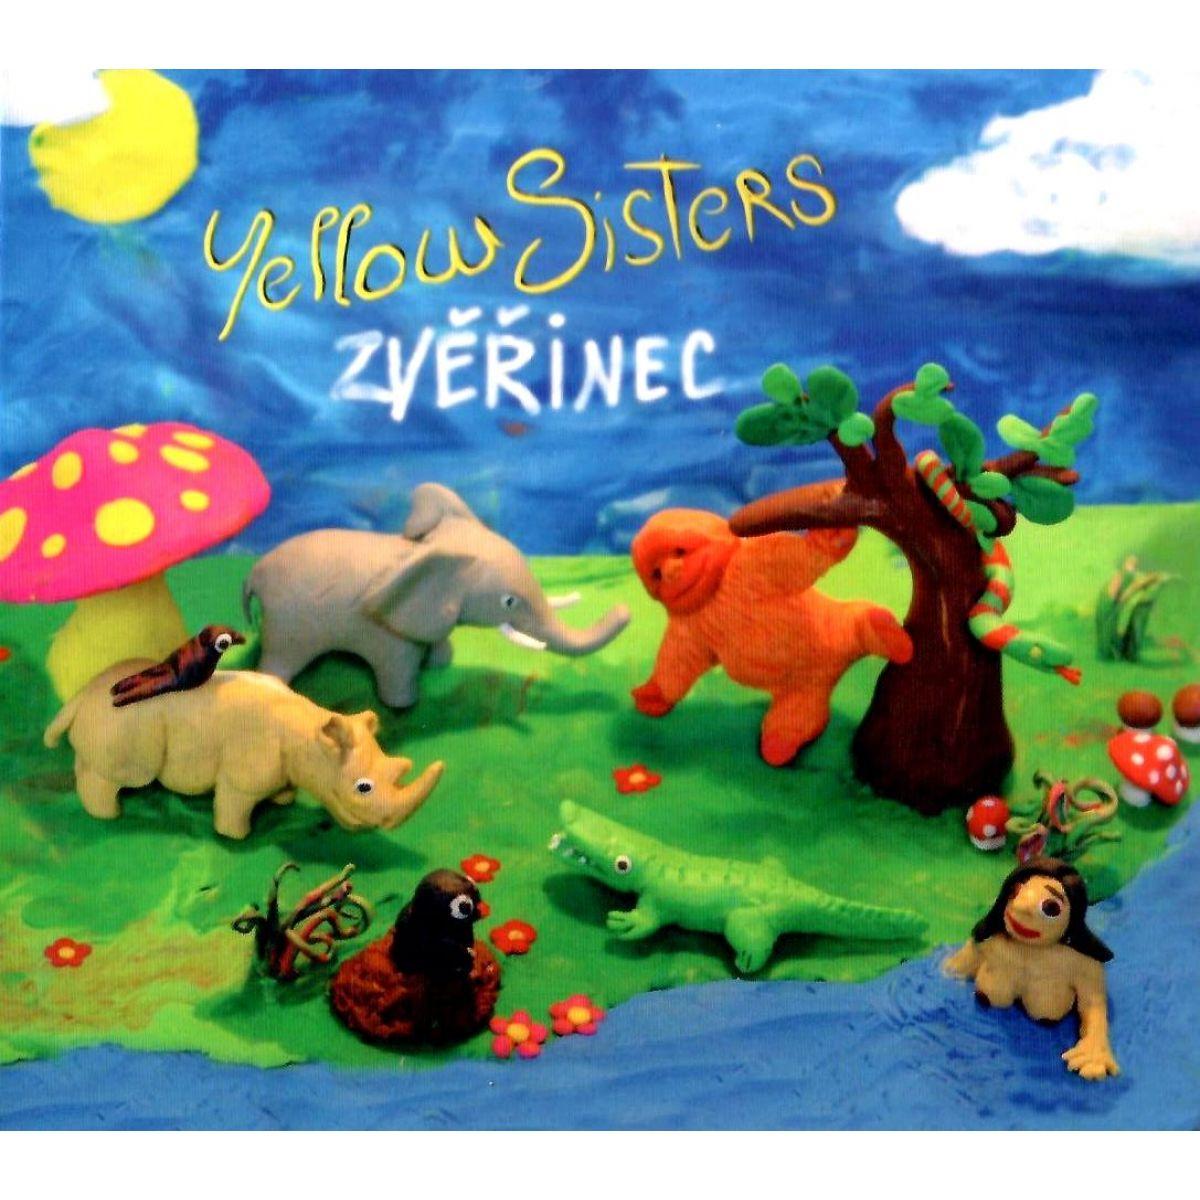 Zvěřinec Yellow Sistters CD